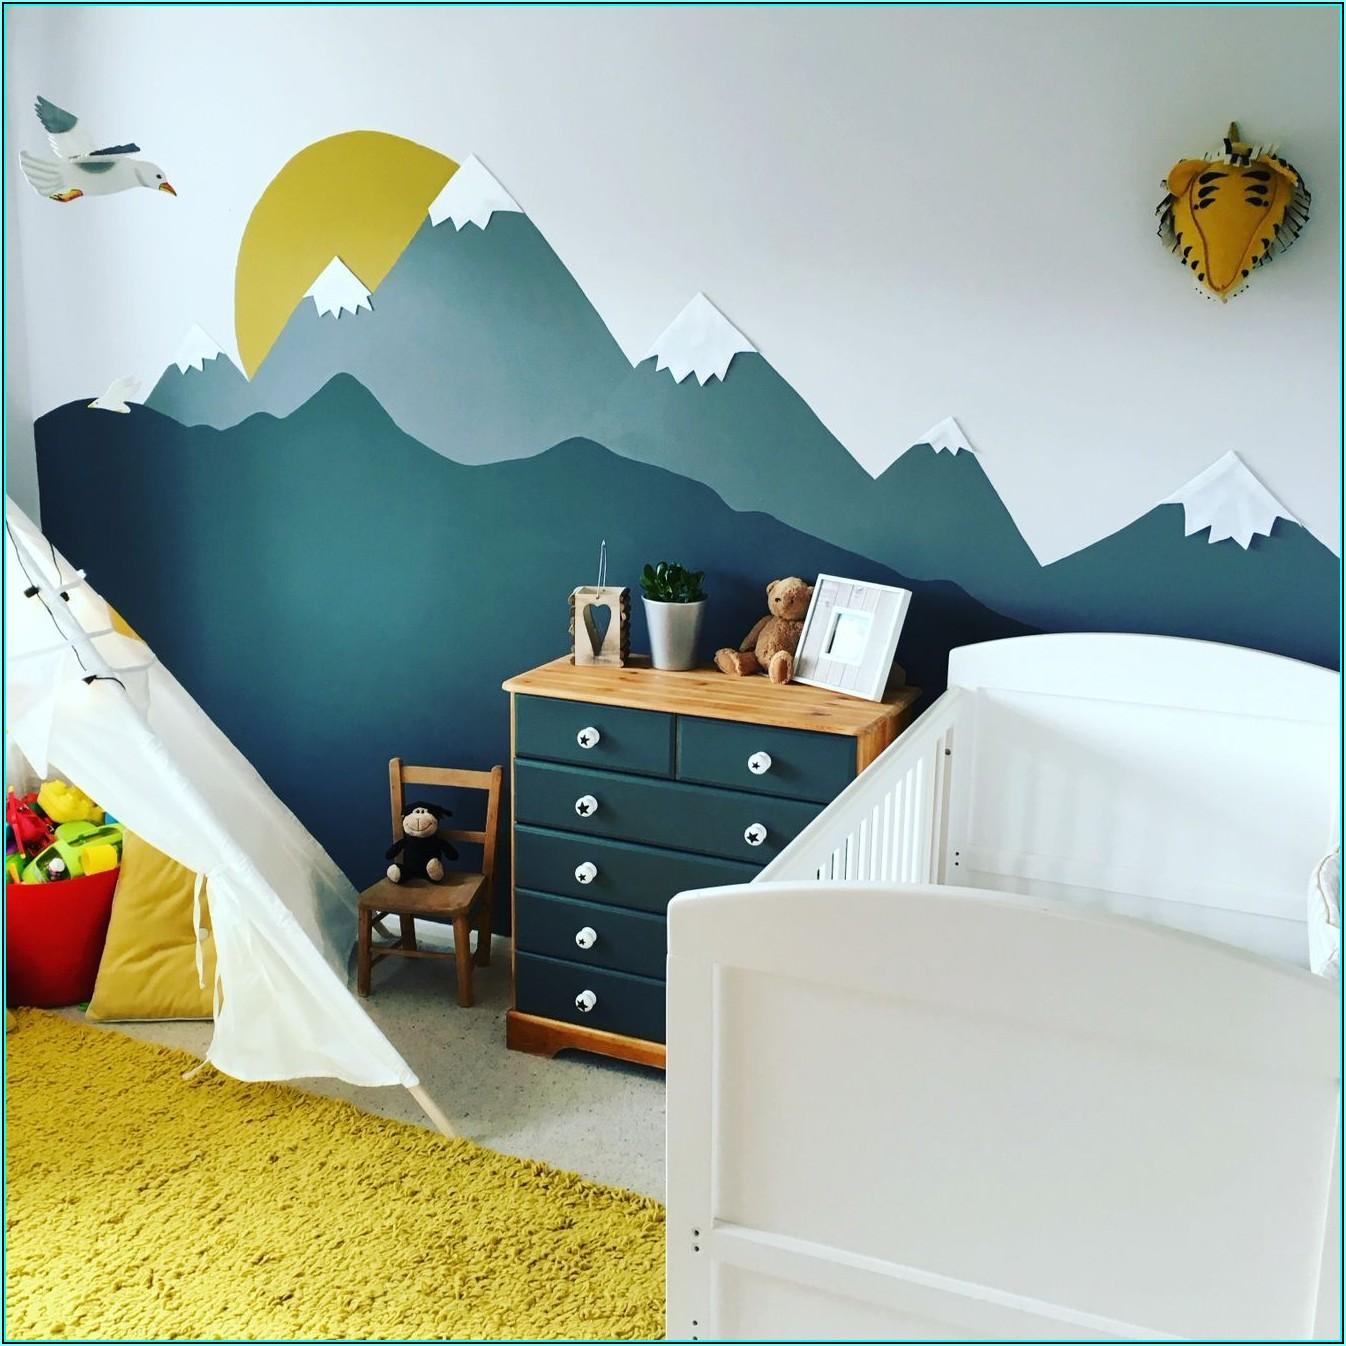 öko Test Wandfarbe Im Kinderzimmer